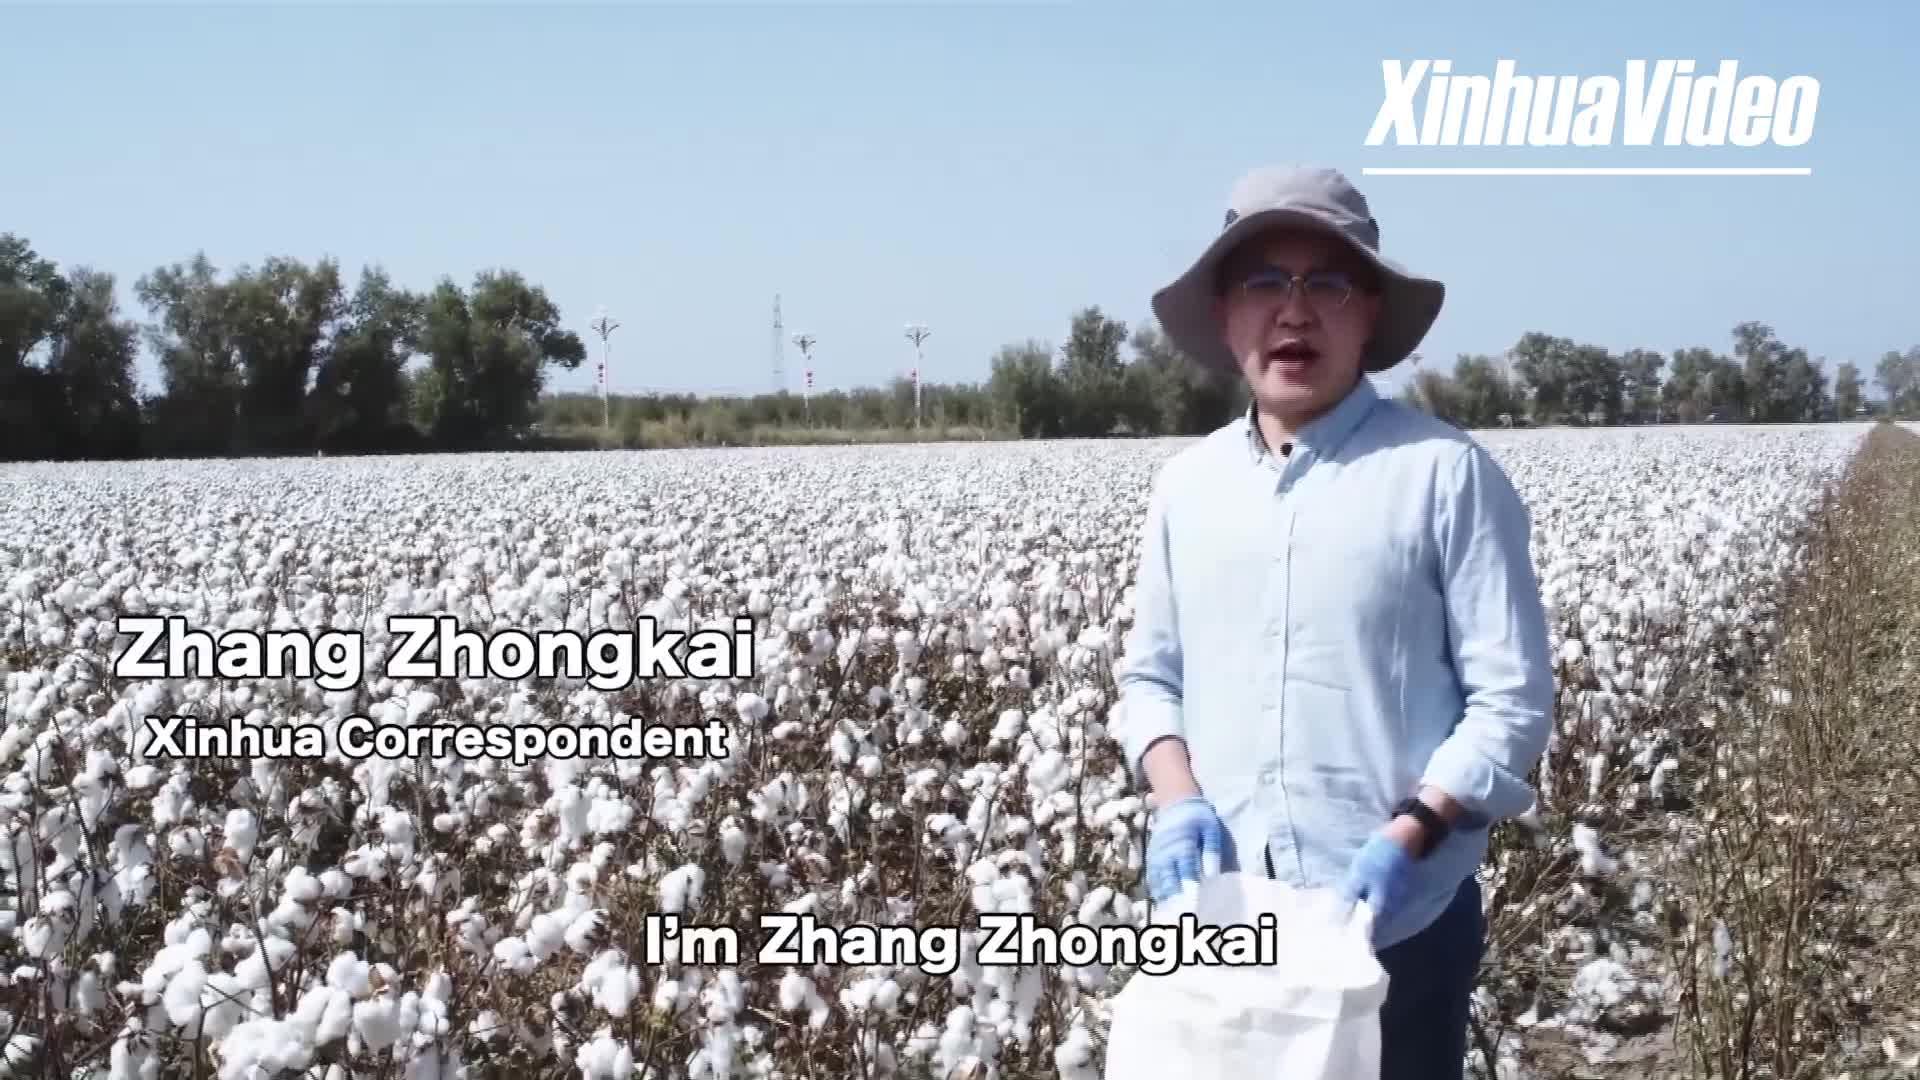 The rise of modern farming in Xinjiang's cotton fields